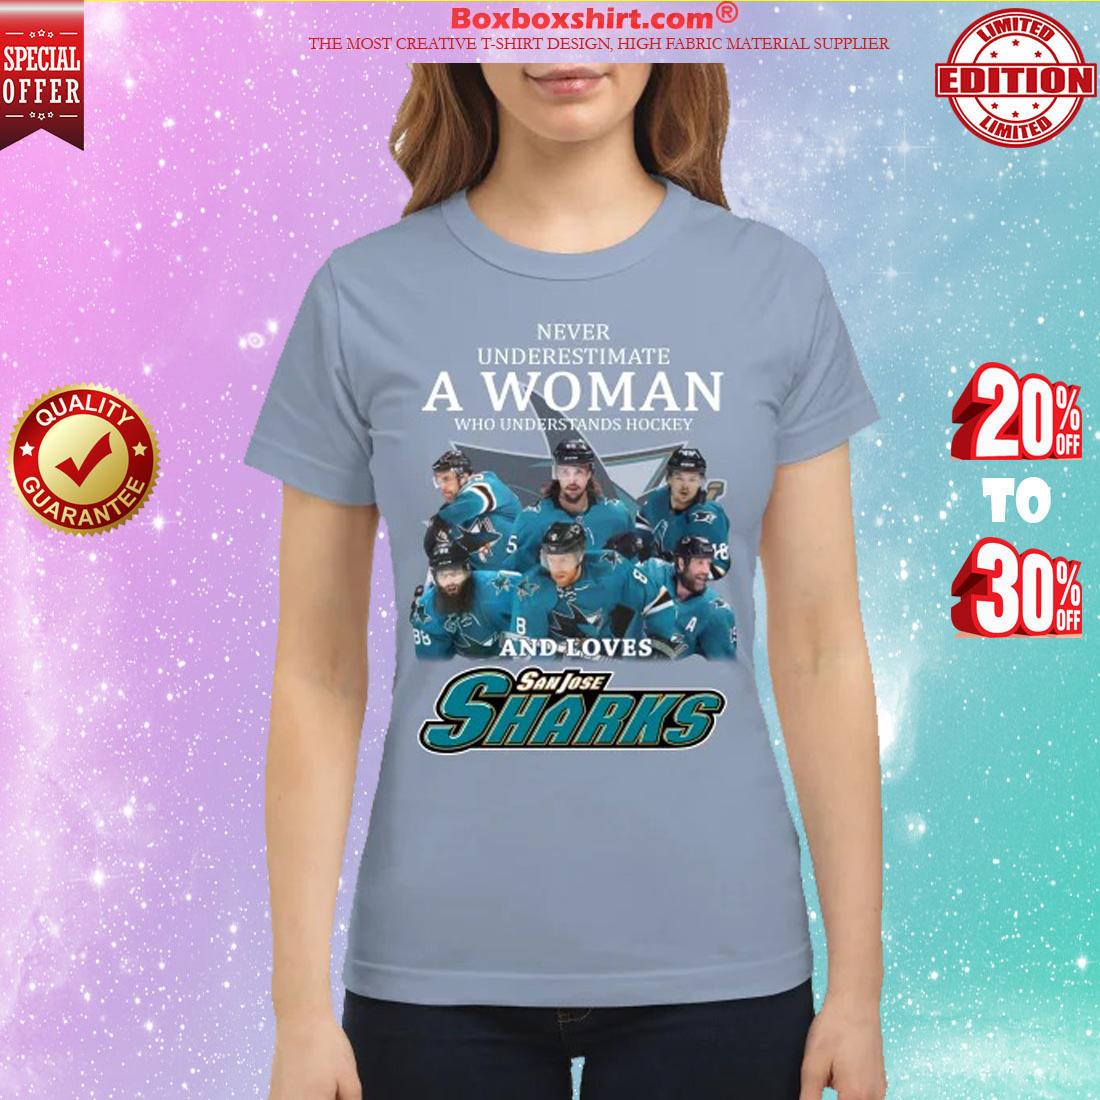 timeless design ff42b 1d5f9 Never underestimate a woman who understands hockey and loves San Jose  sharks shirt